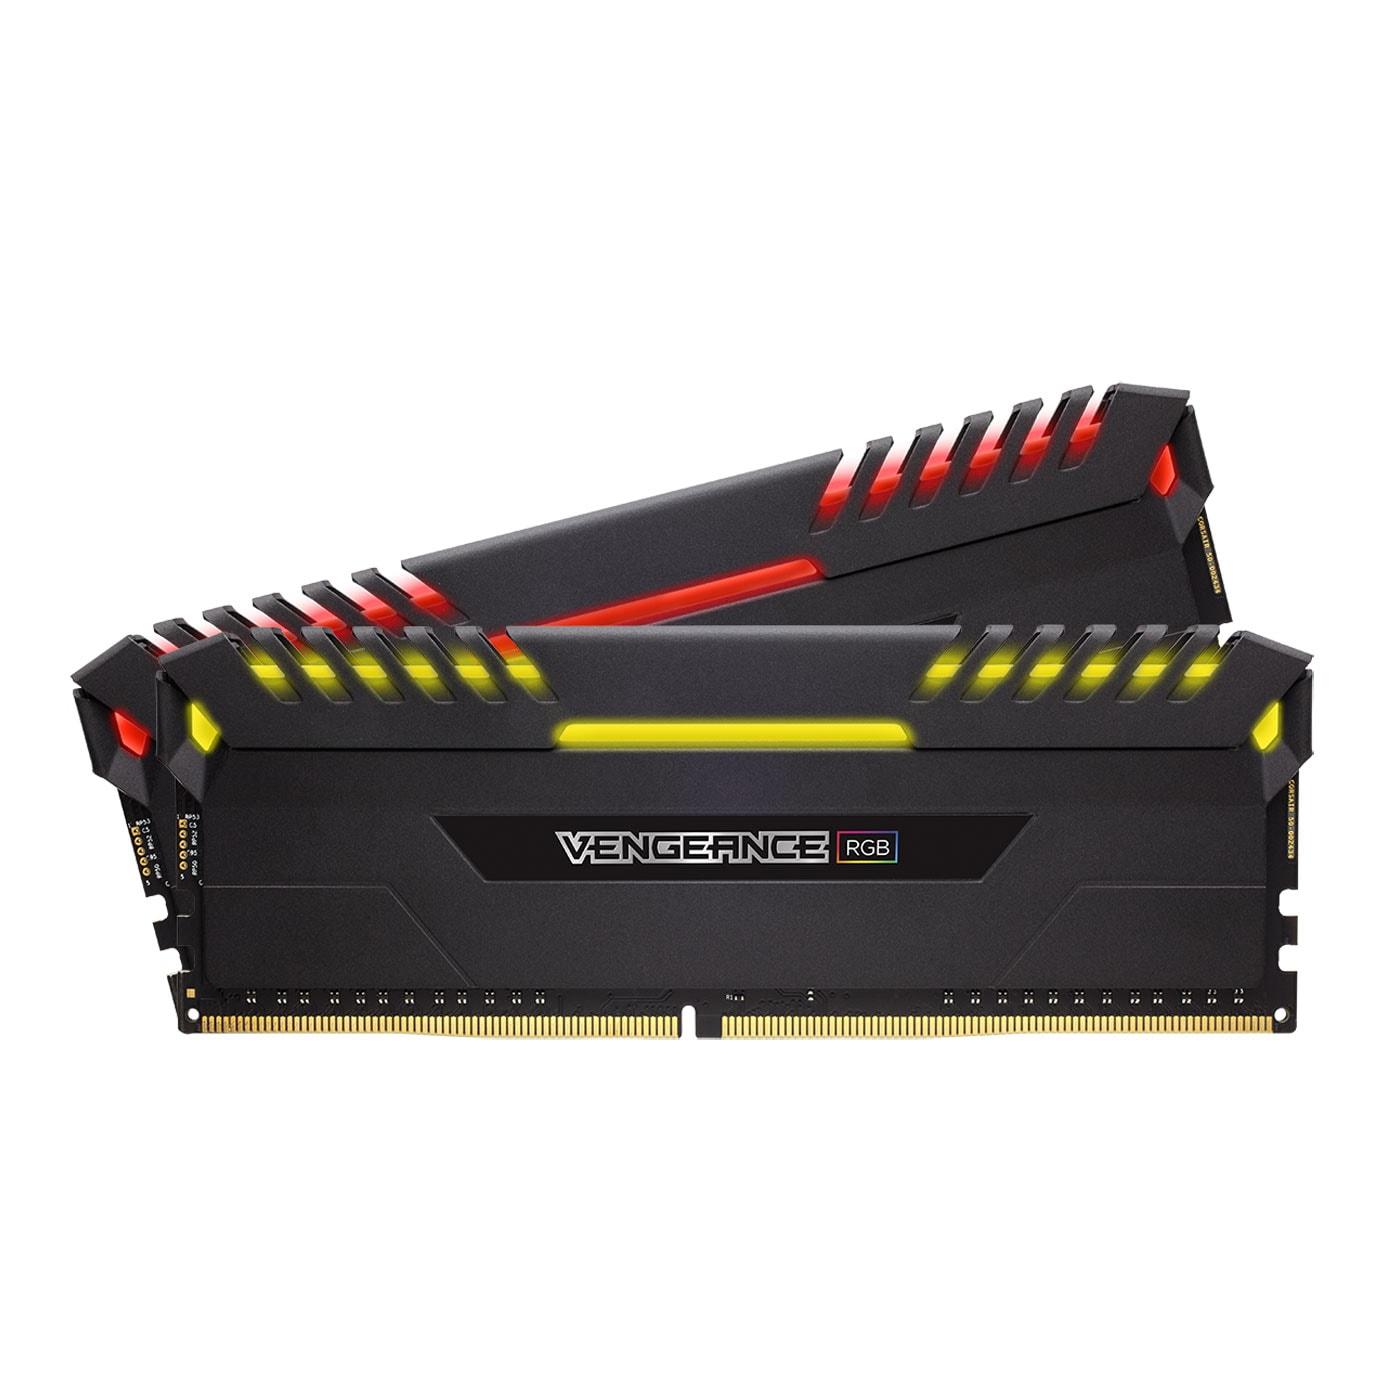 Corsair CMR16GX4M2A2666C16 RGB  16Go DDR4 2666MHz - Mémoire PC - 4